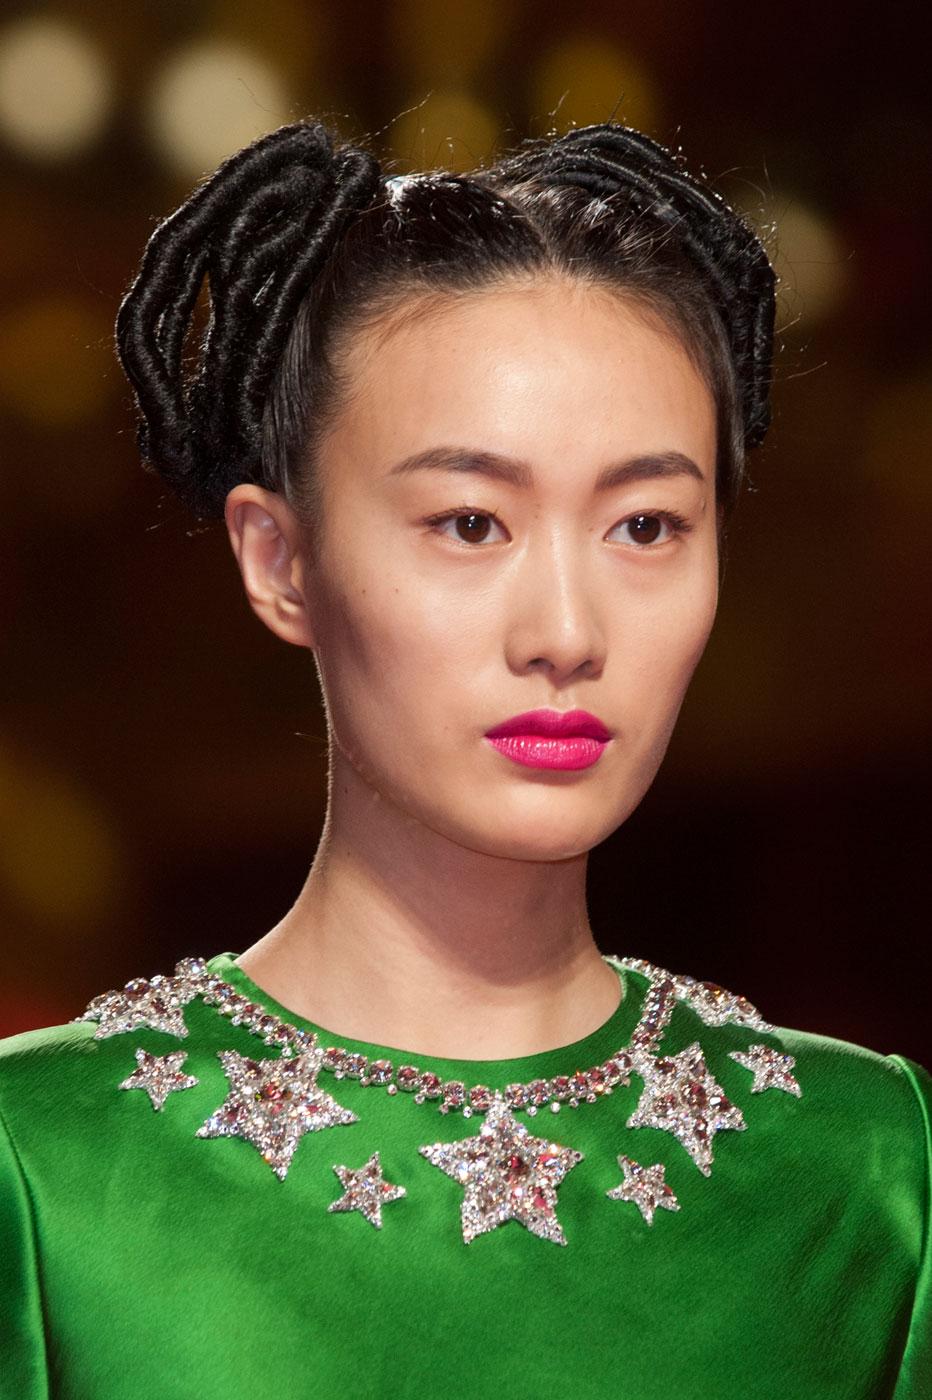 Schiaparelli-fashion-runway-show-close-ups-haute-couture-paris-spring-summer-2015-the-impression-20